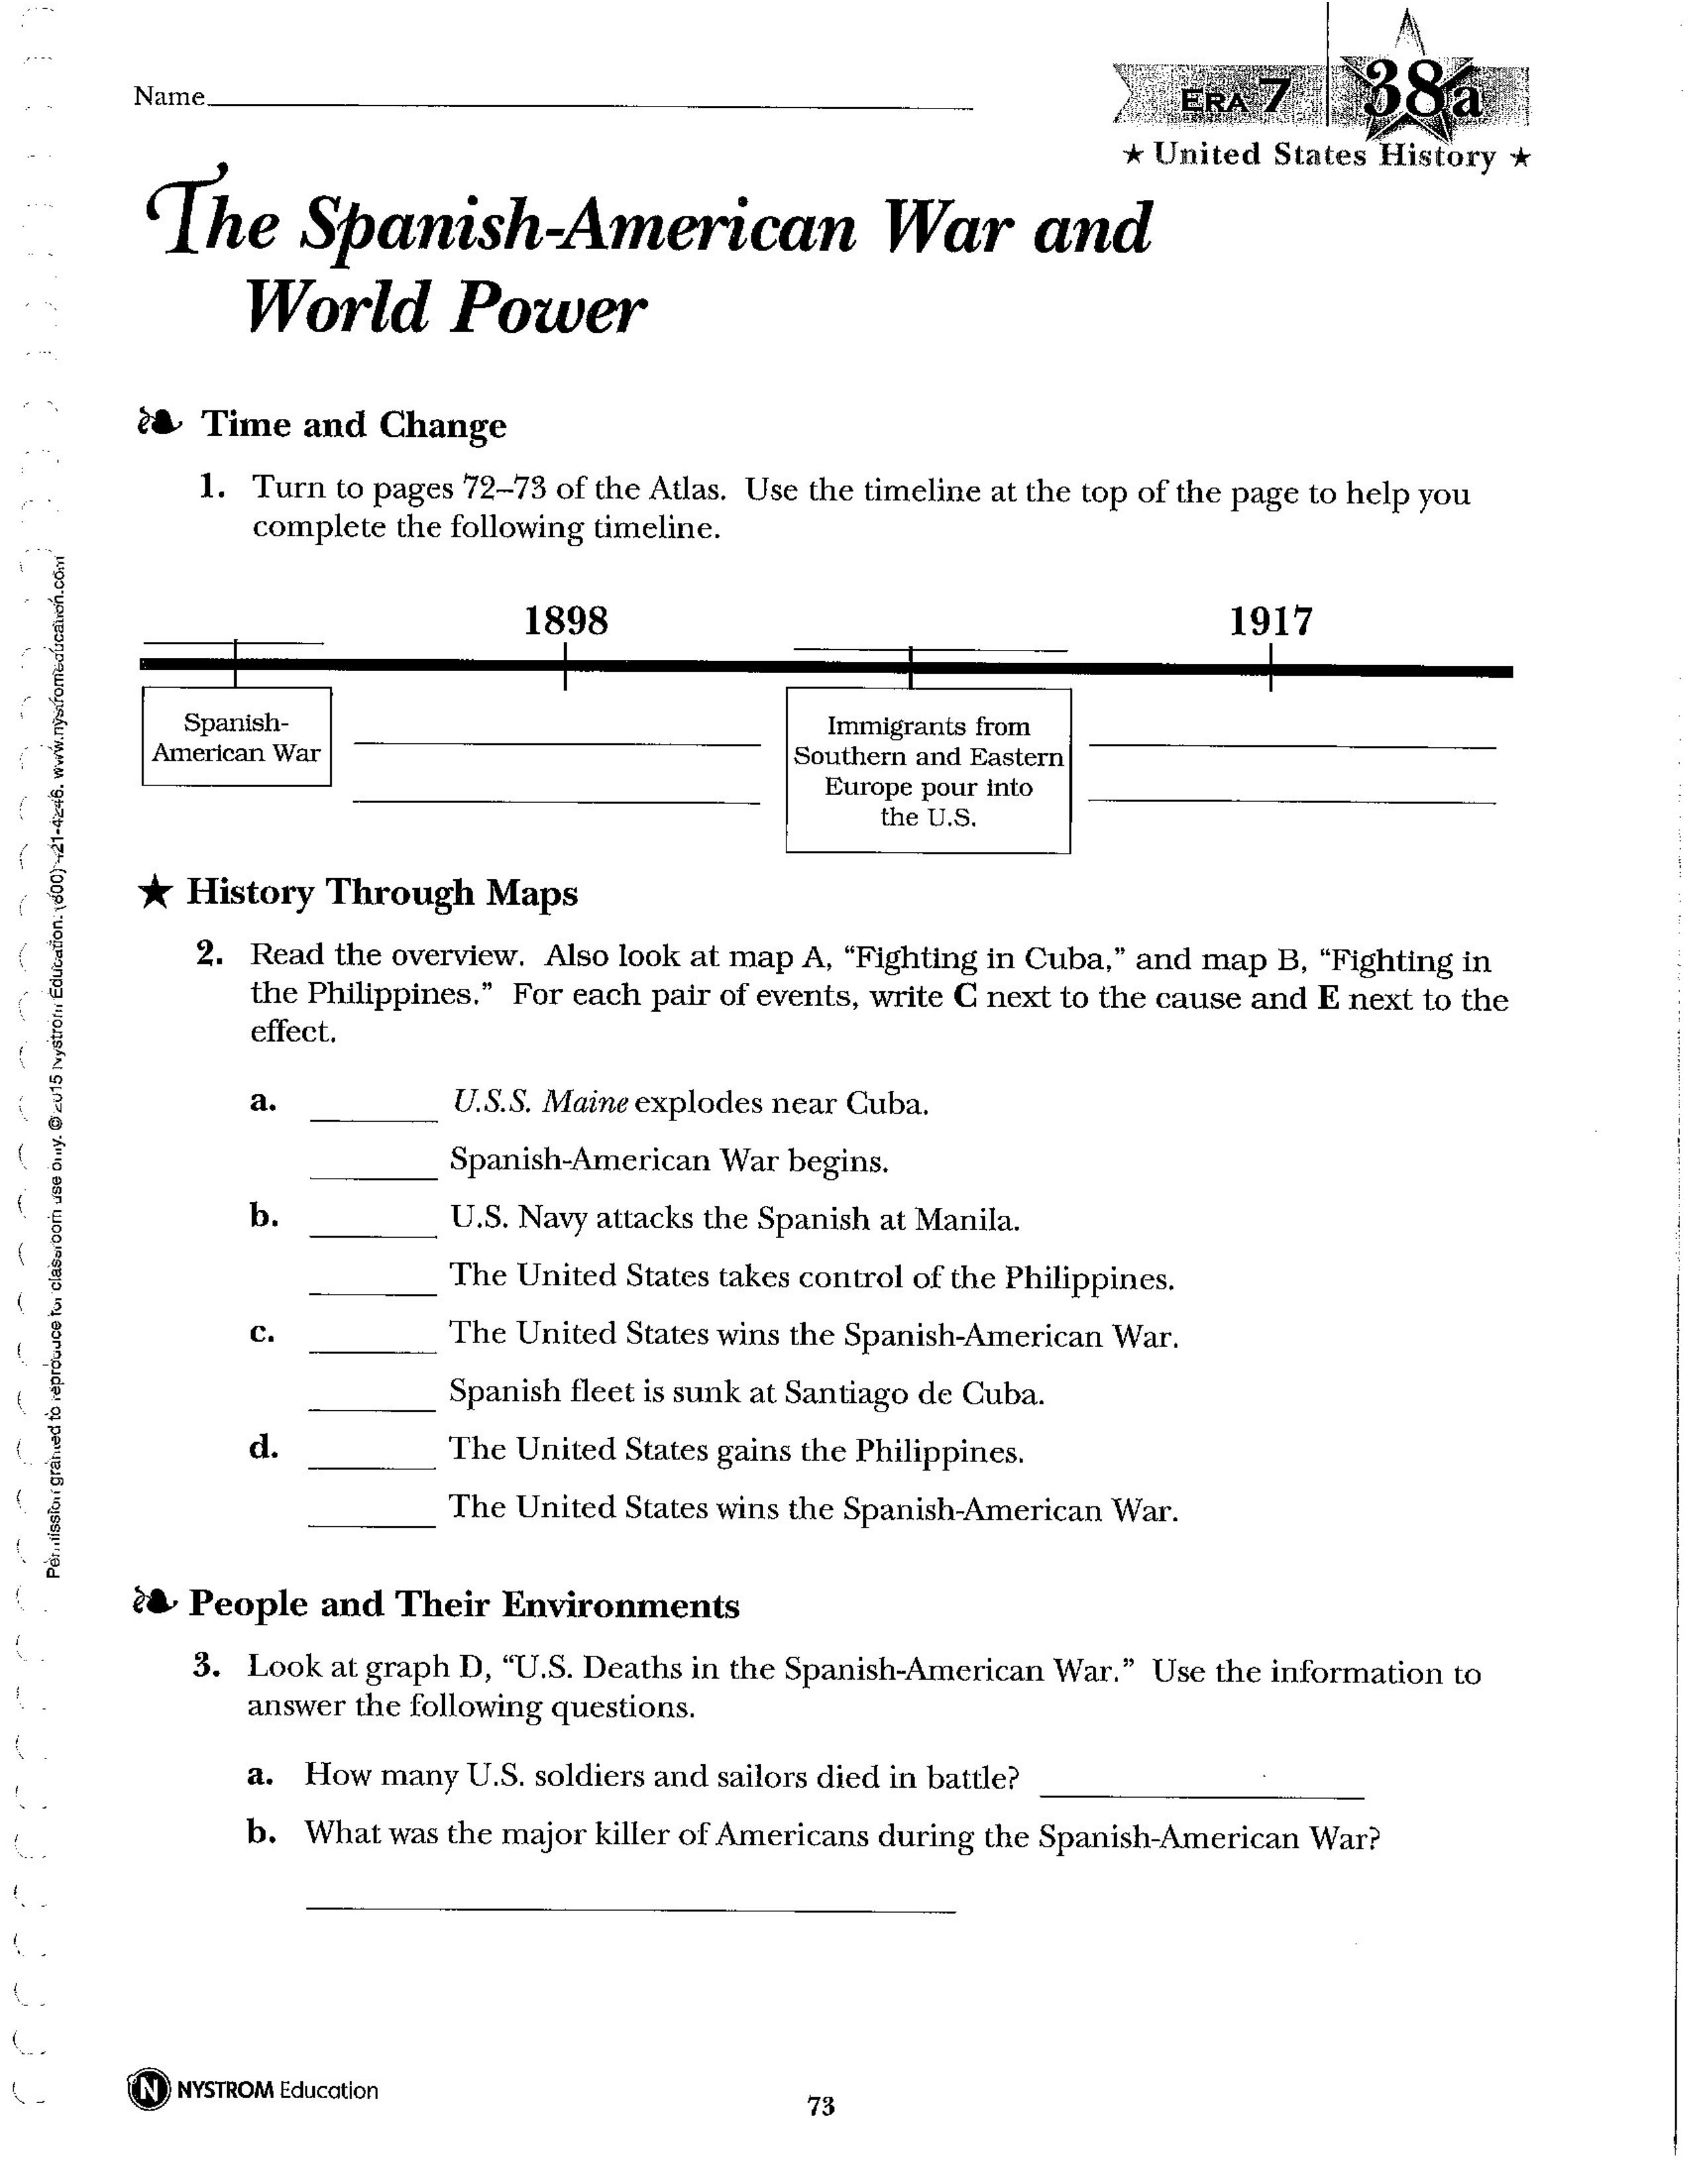 NAUSH 38 The Spanish-American War and World Power - Amy ...